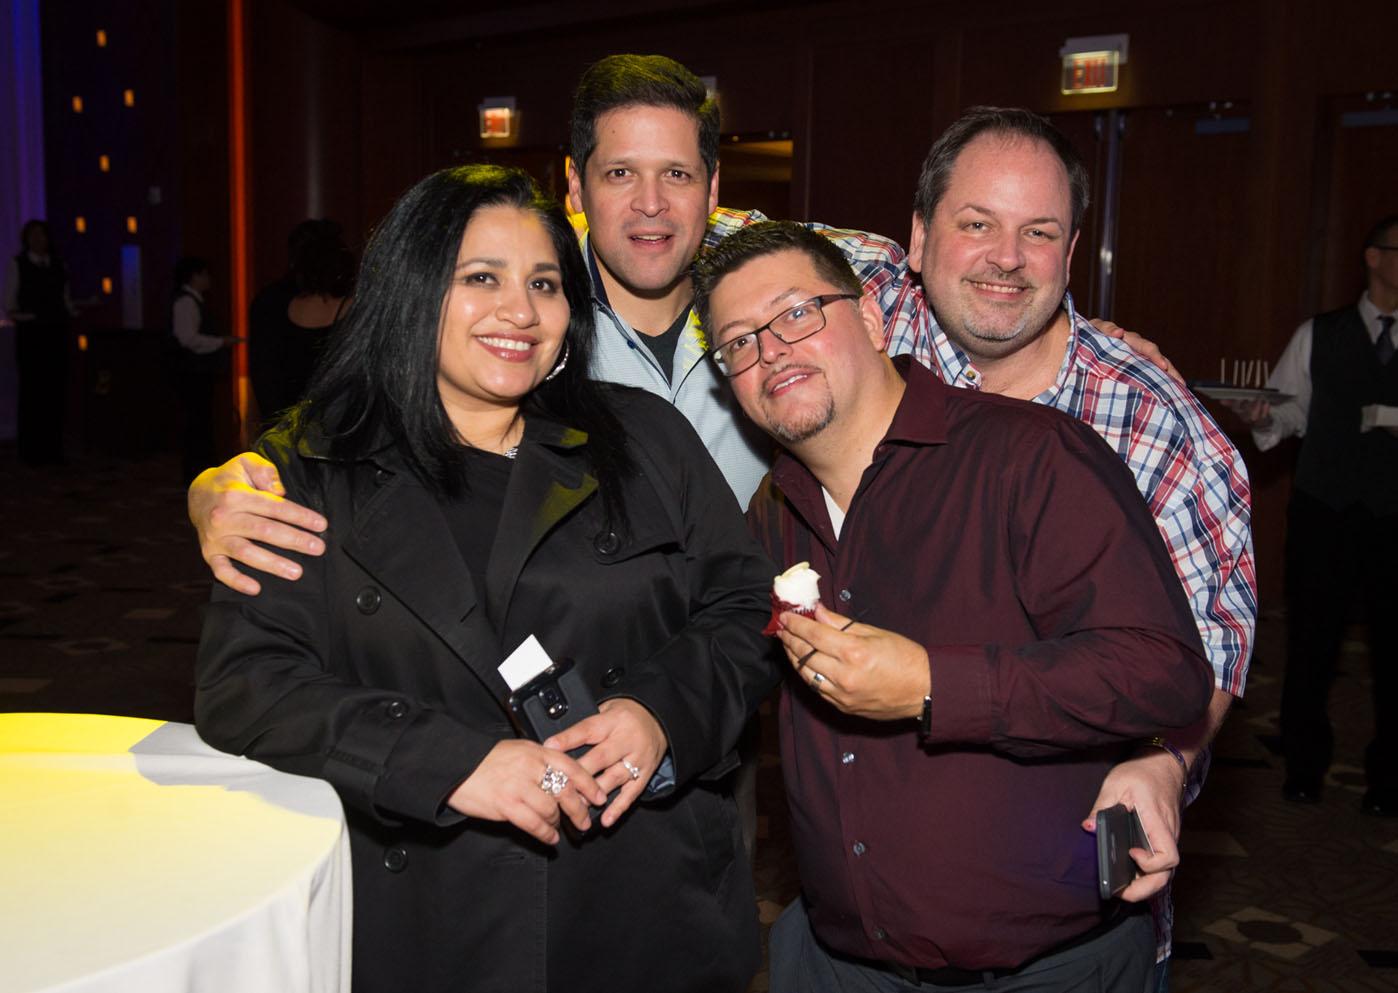 2015-12-09 ReMax Corpoarte Event - The Borgata - Atlantic City NJ - Photo Sesh - 2015-5035.jpg